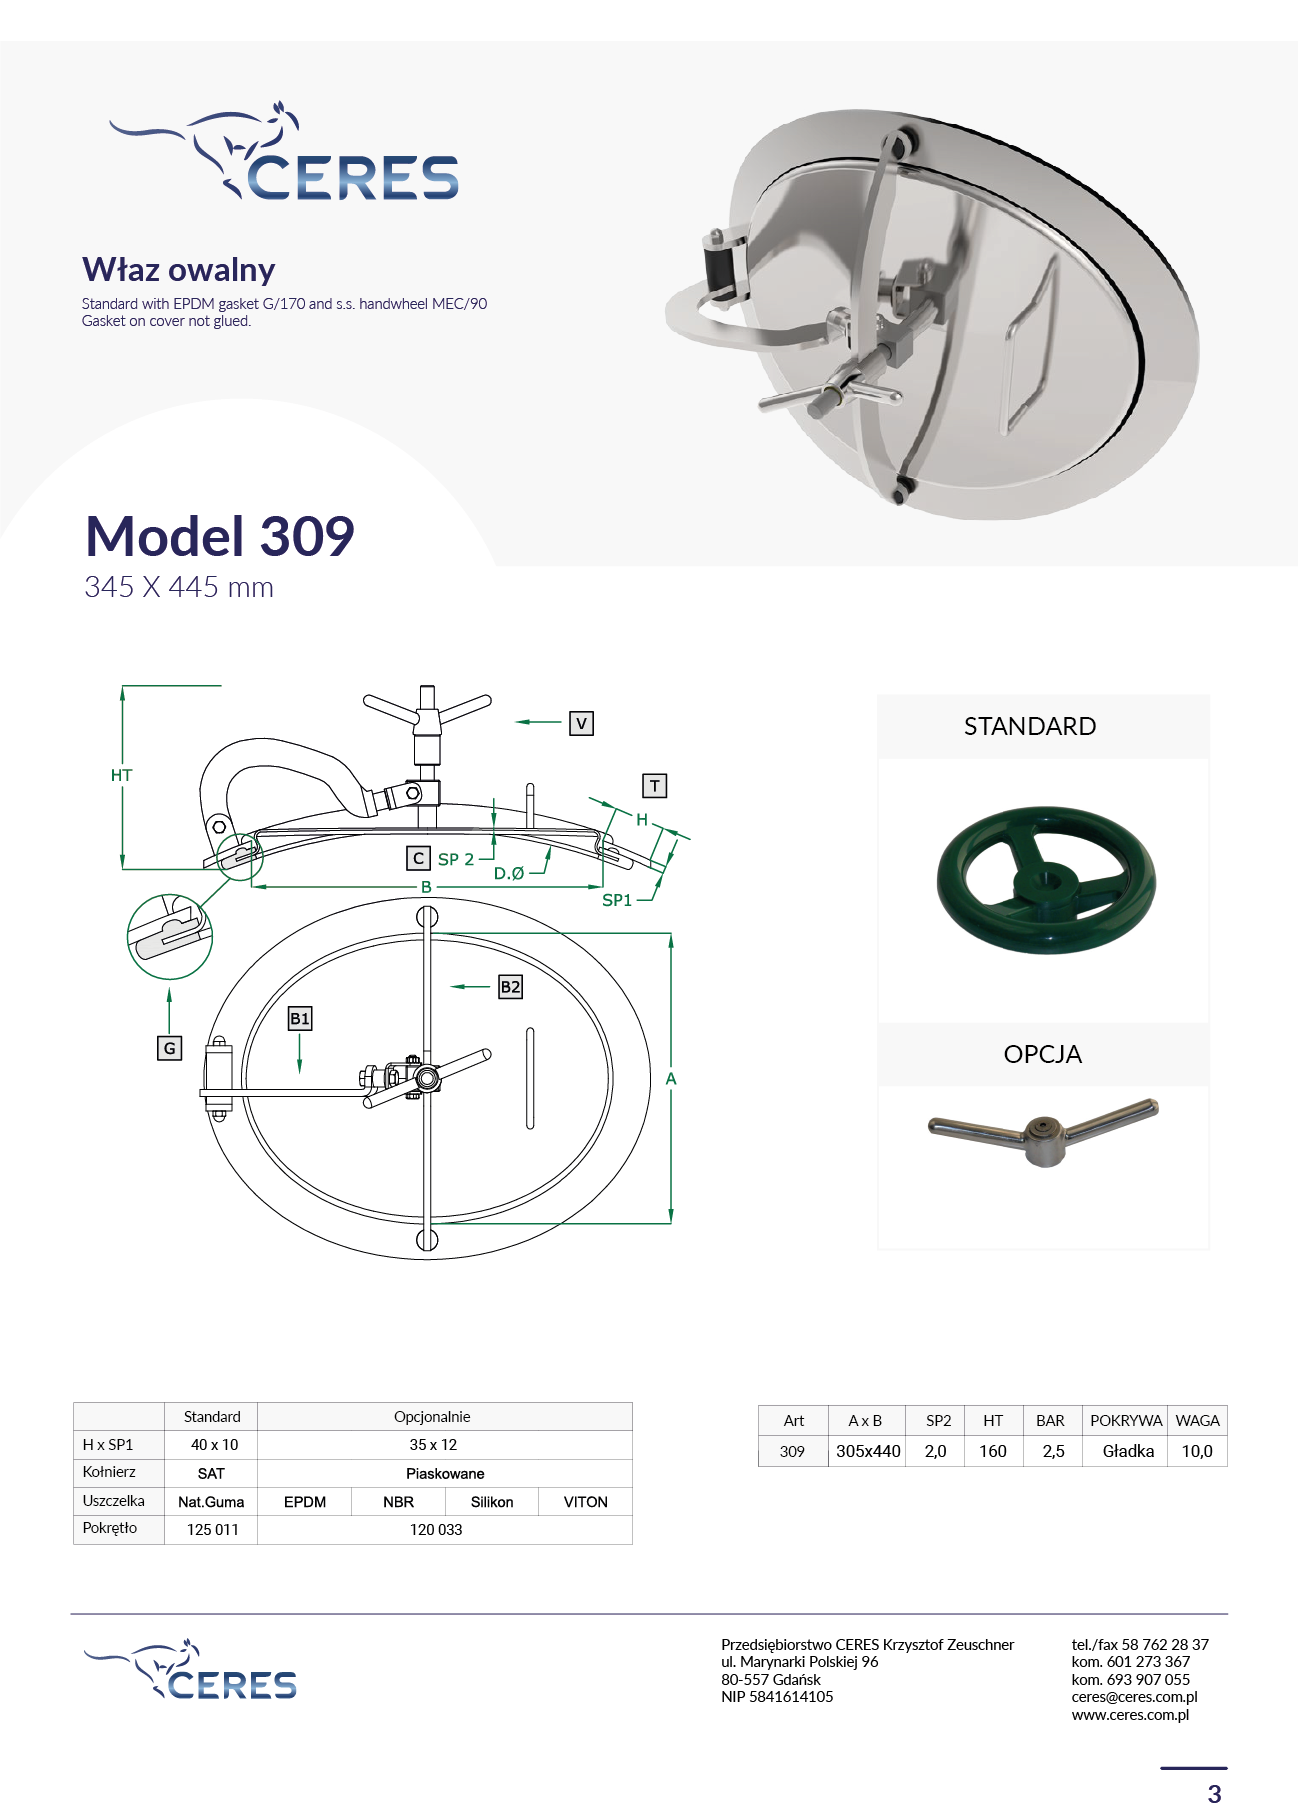 MODEL 309